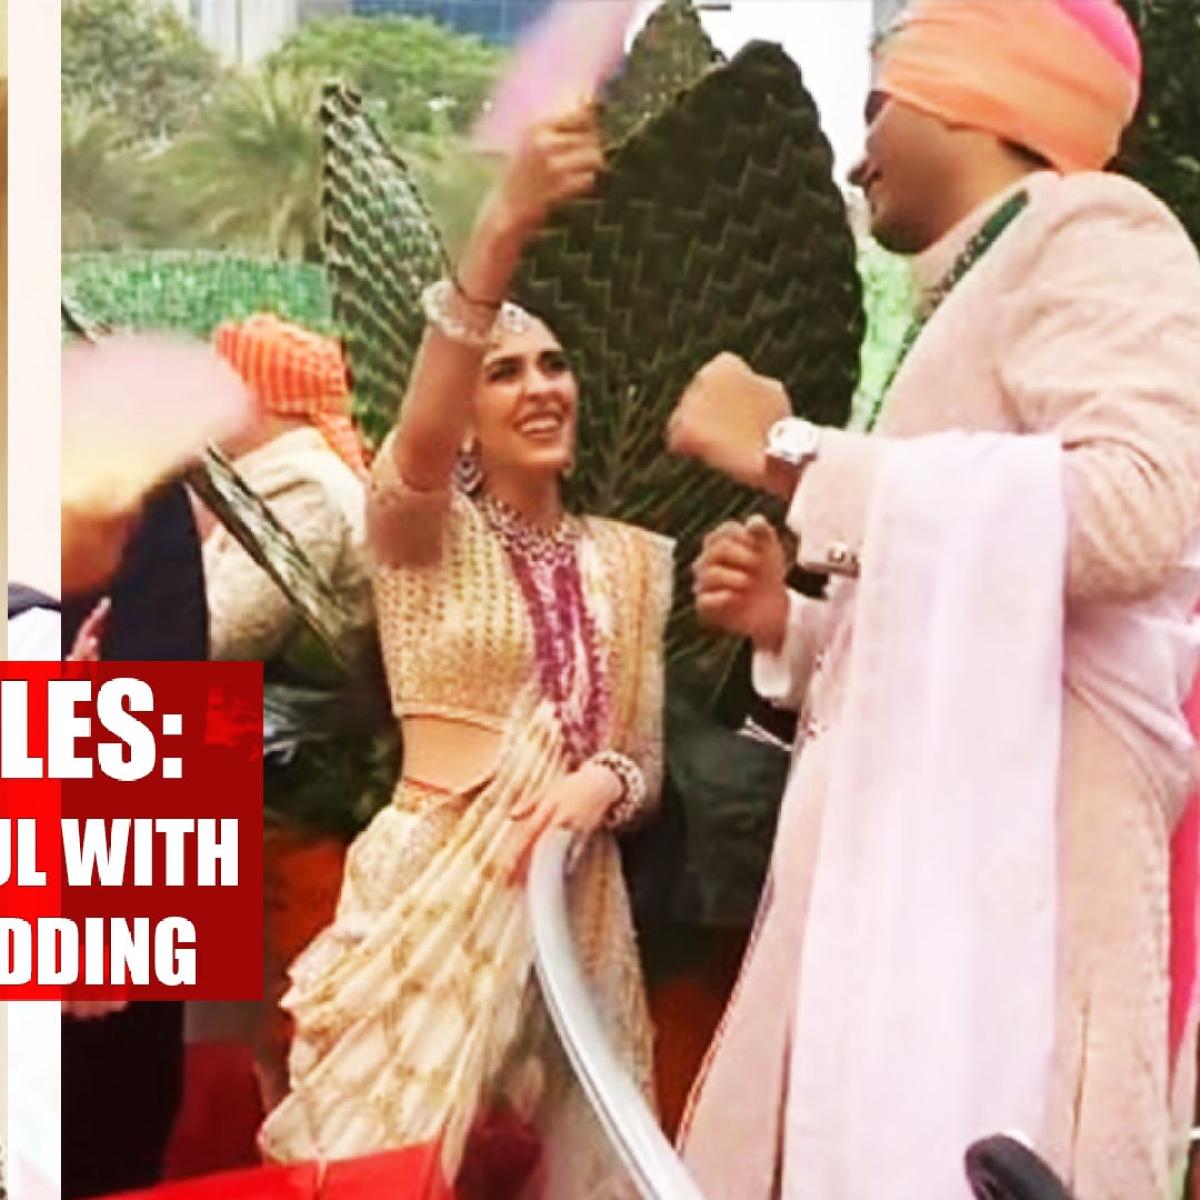 Bhabhi-Devar Tales: Shloka Mehta gets playful with Arjun Kothari at his wedding, watch video